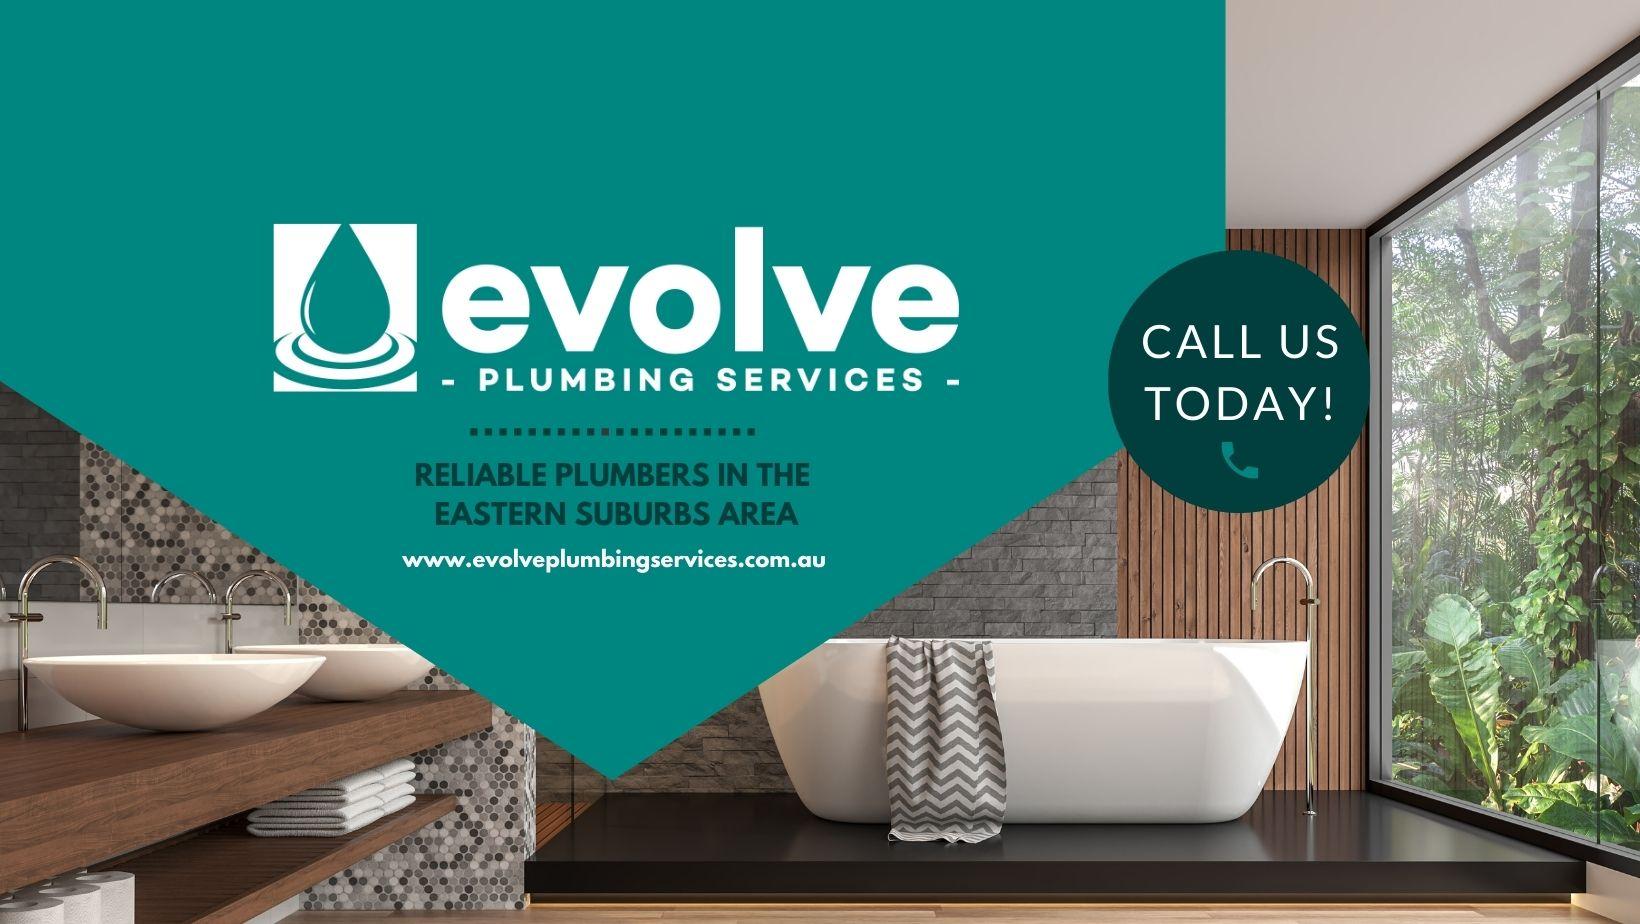 Evolve Plumbing Services